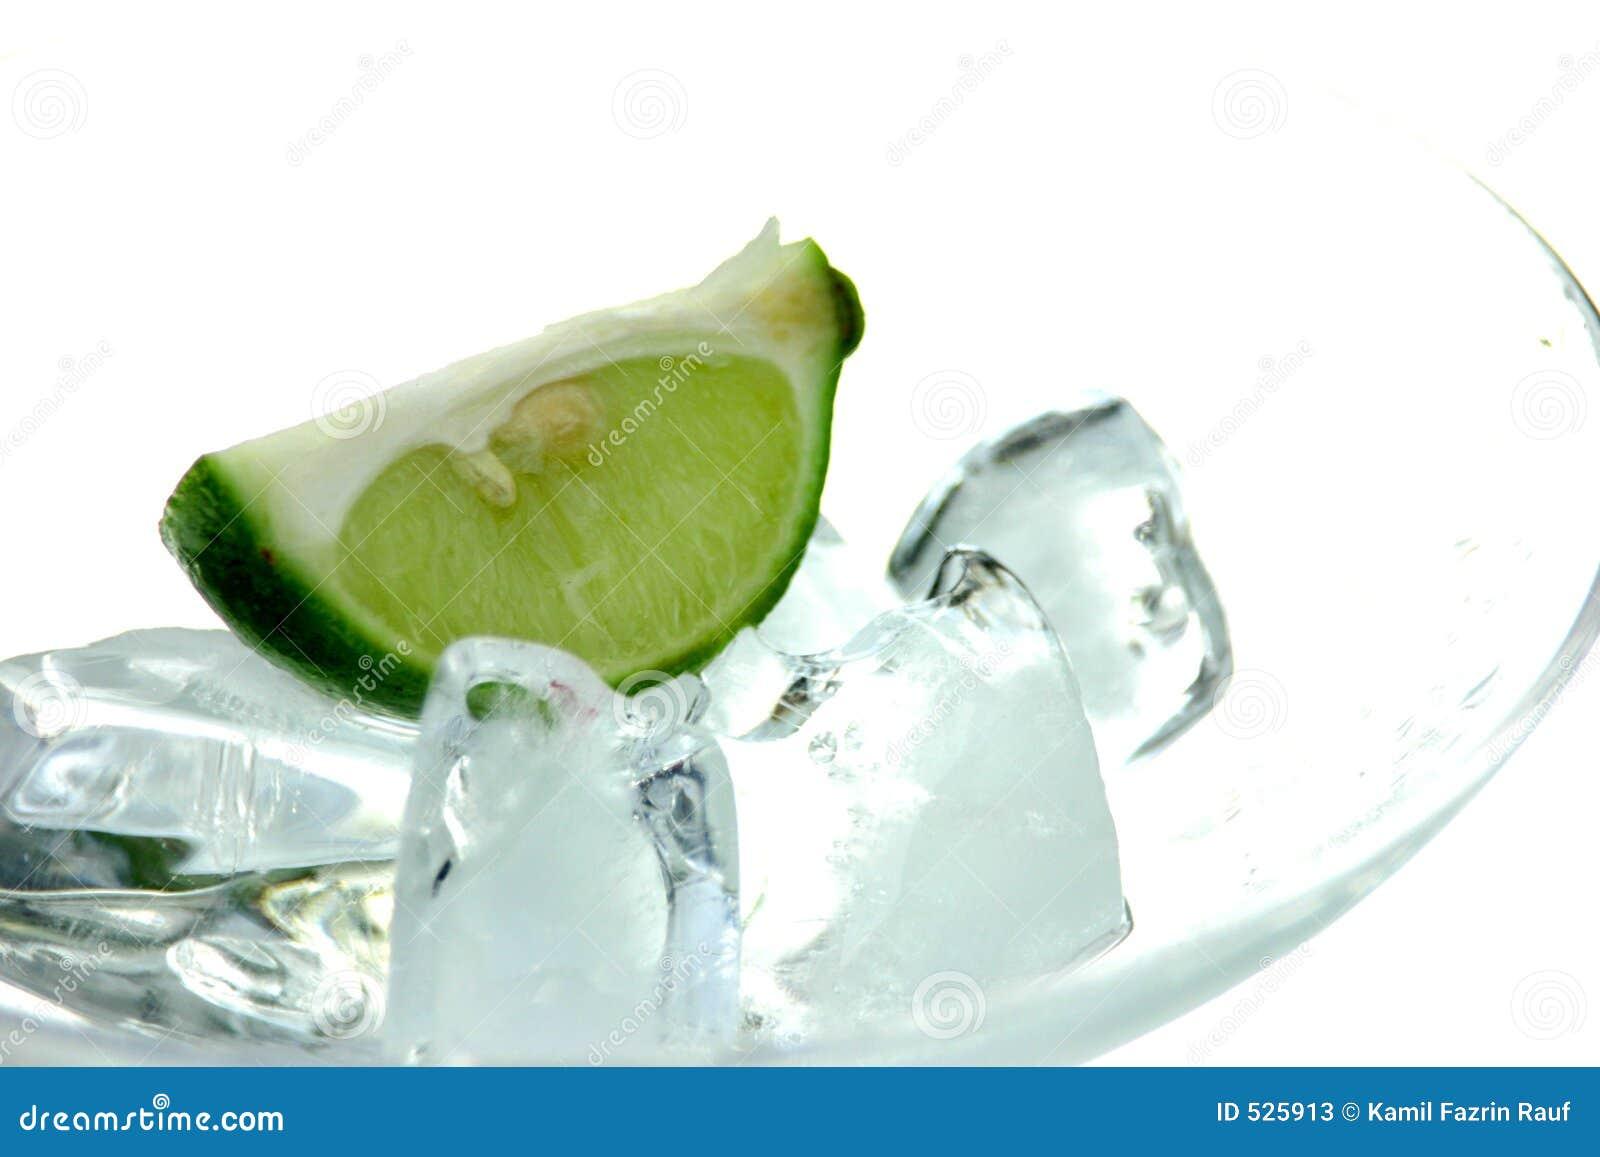 Download 冰马蒂尼鸡尾酒 库存图片. 图片 包括有 背包, 饱和, 石灰, 种子, 绿色, 冷颤, 变冷, 饮料, 空白 - 525913